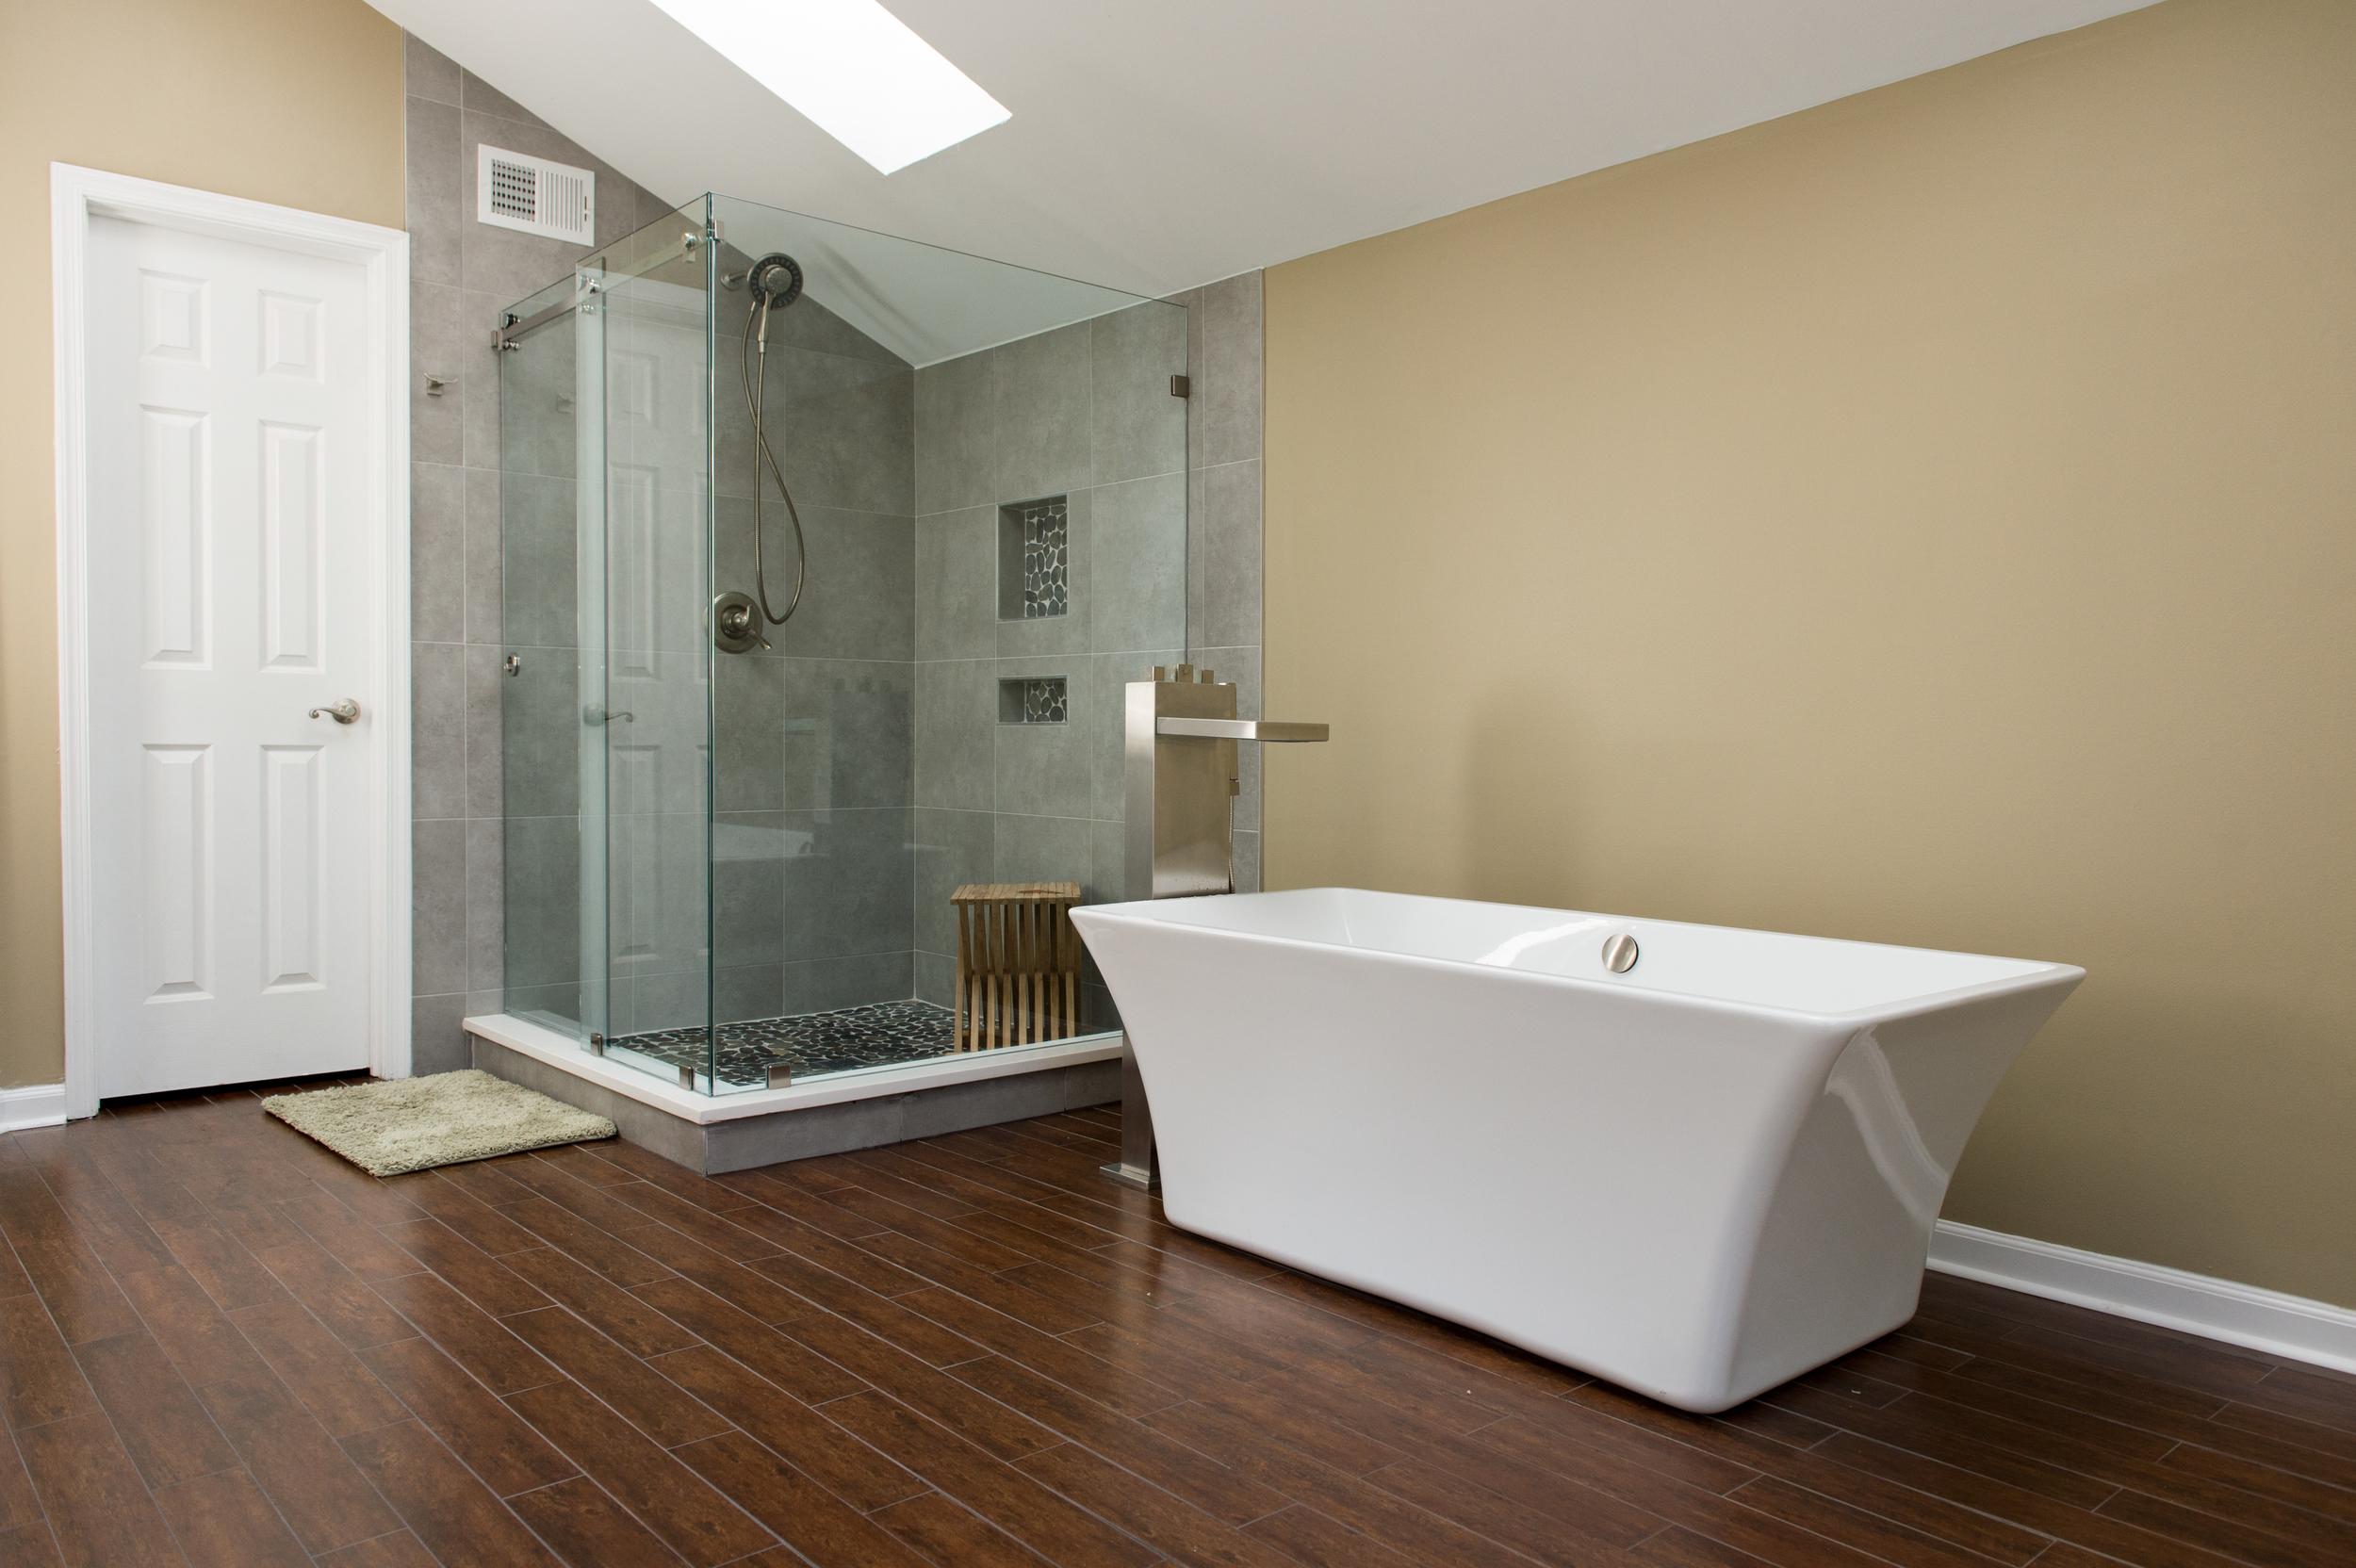 Bathroom Remodeling Silver Spring, MD